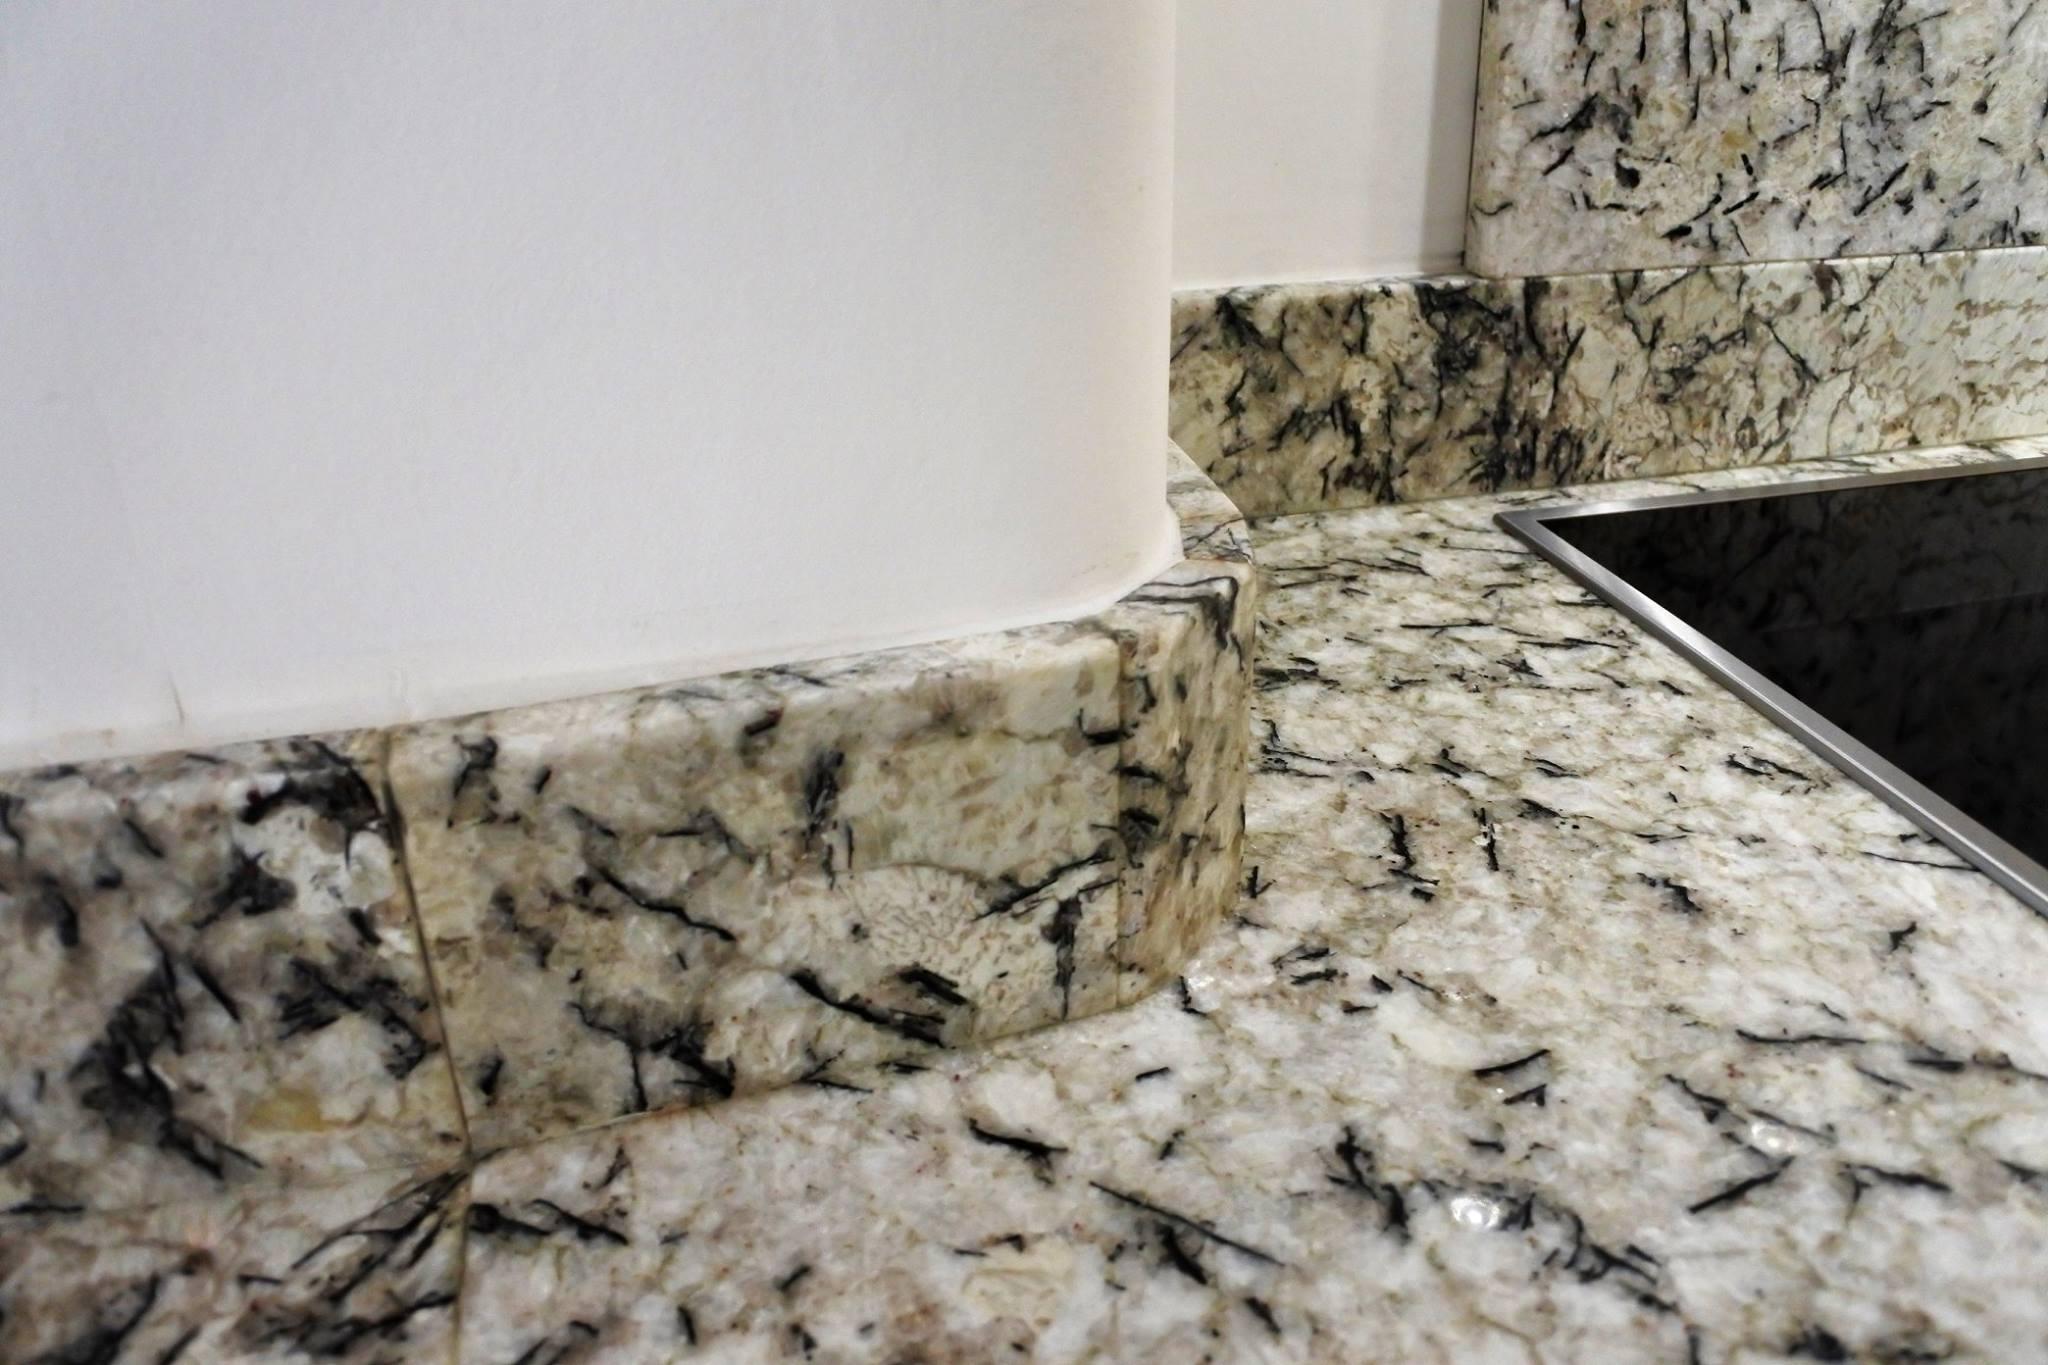 glasgow-bespoke-kitchens-granite-worksurface